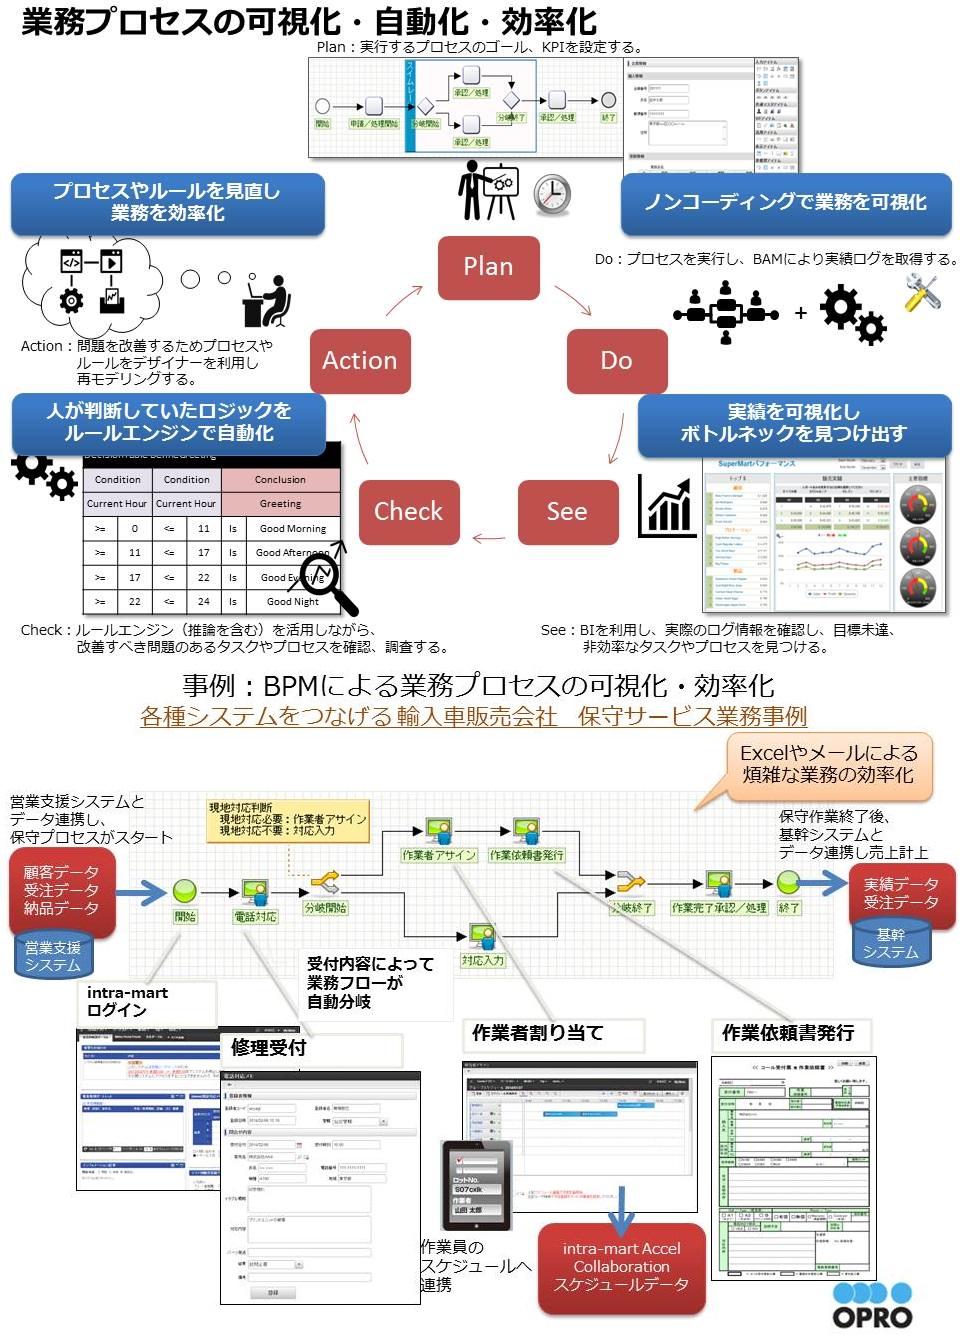 BPM/ワークフロー統合ツール「IM-BIS」